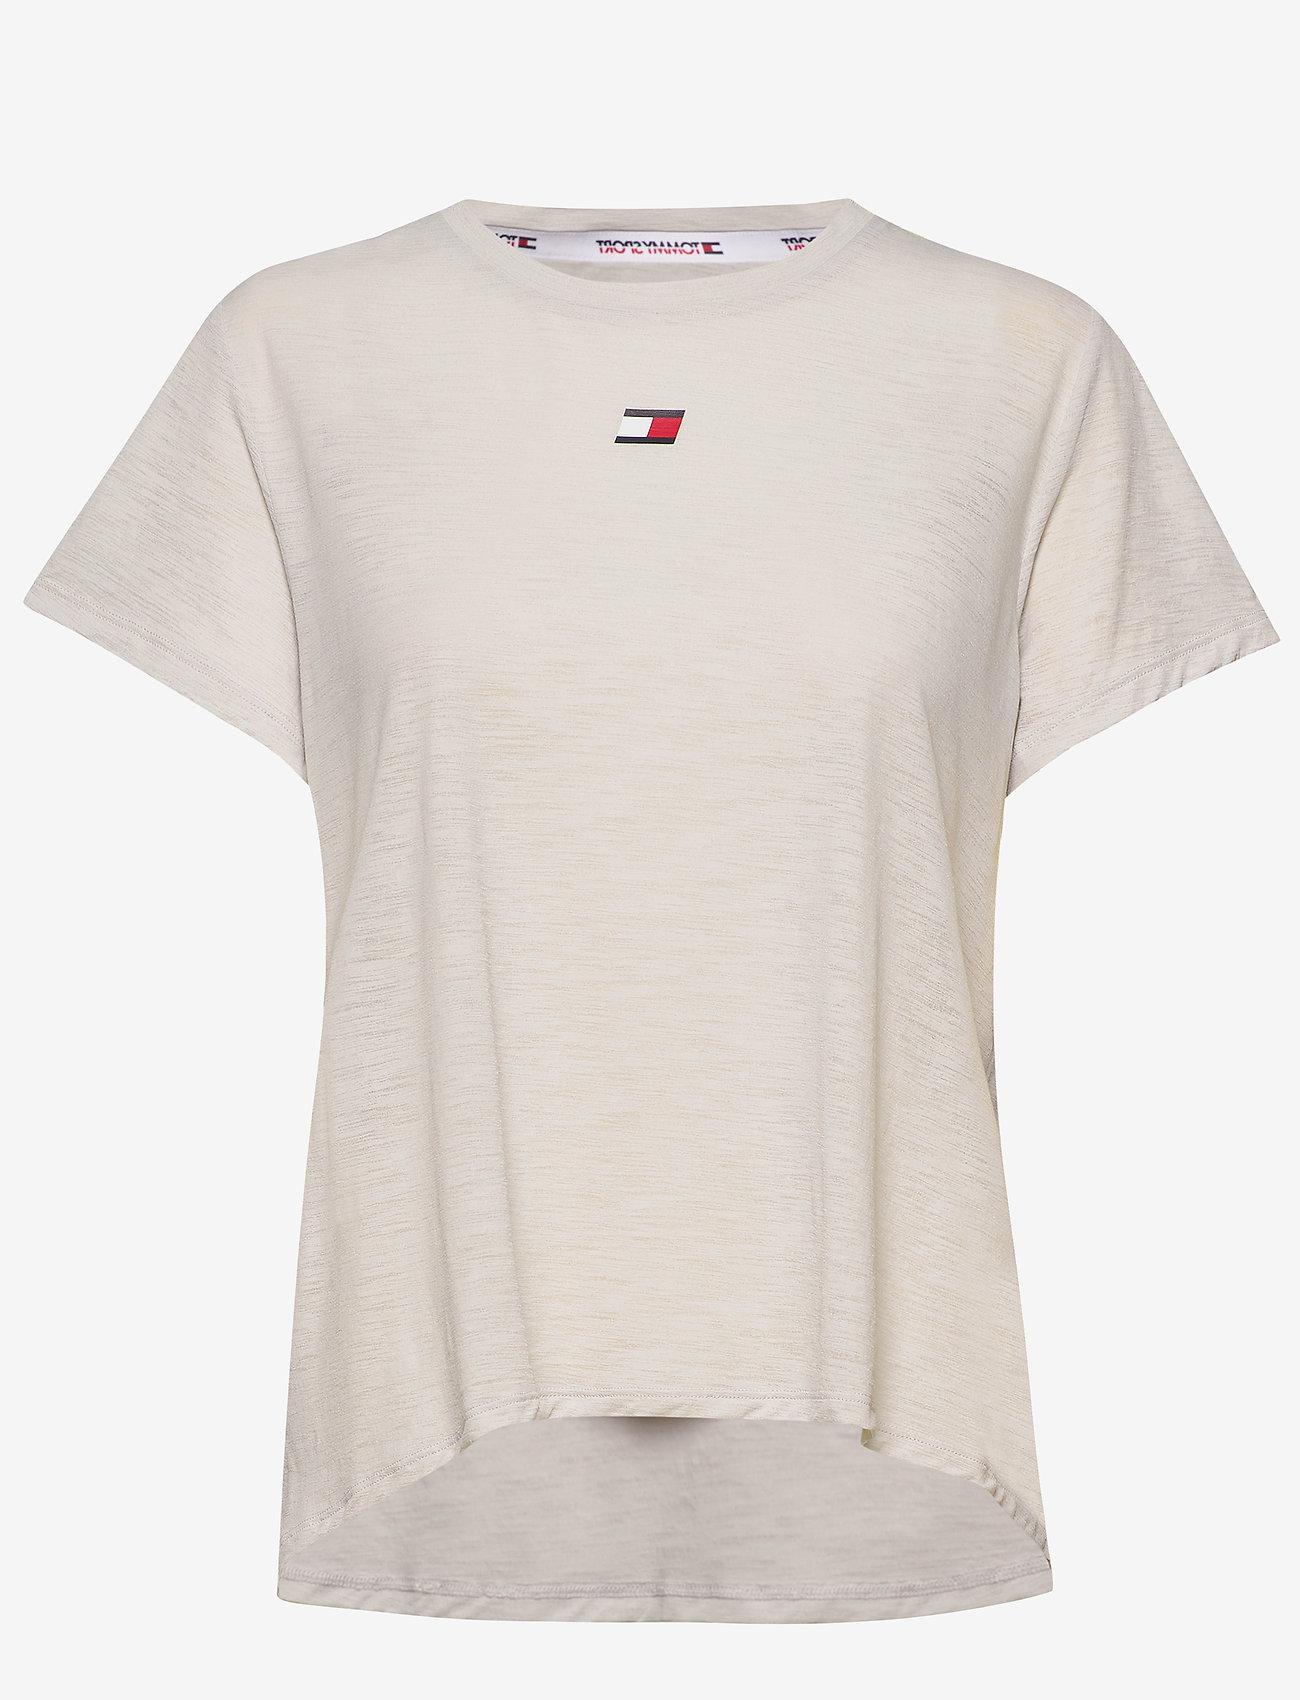 Tommy Sport - PERFORMANCE LBR TOP - t-shirts - light cast - 0